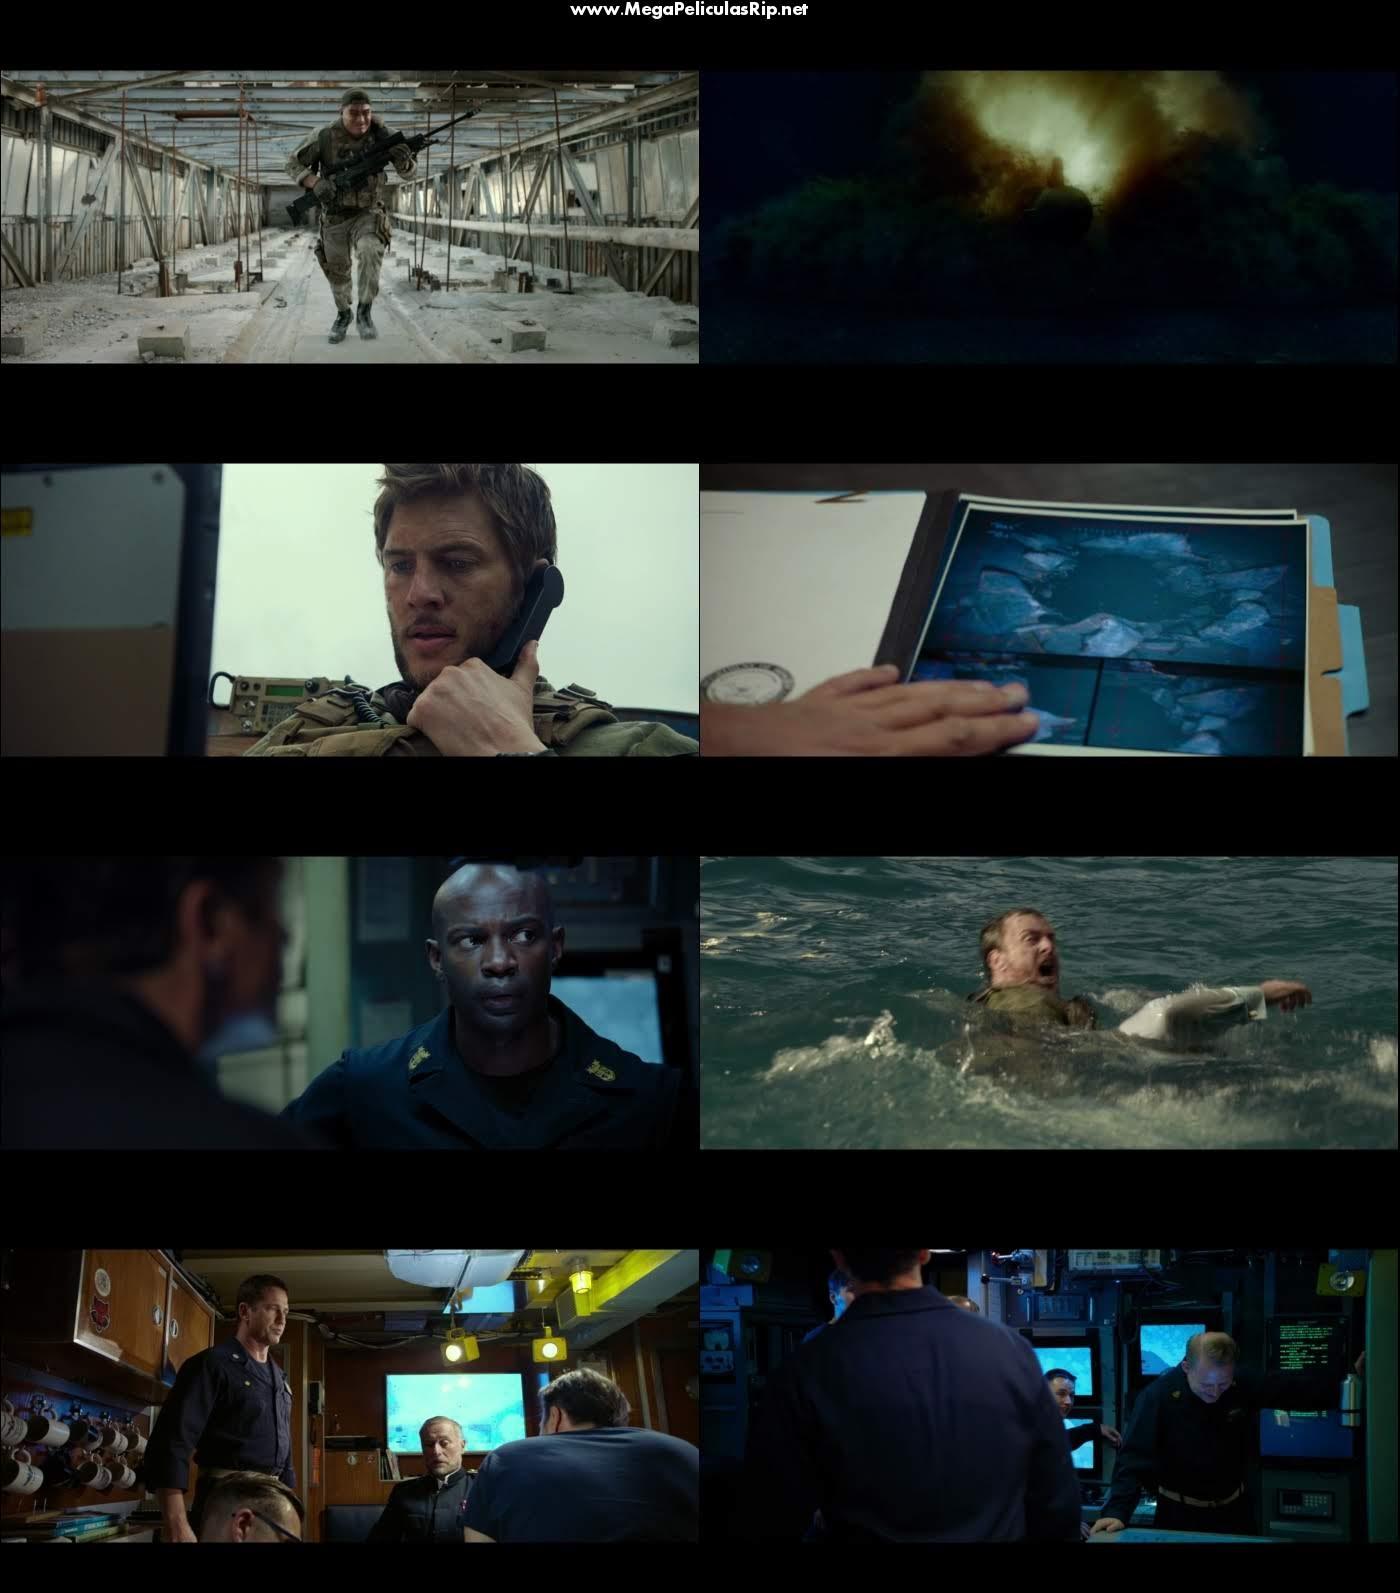 Mision submarino 1080p Latino